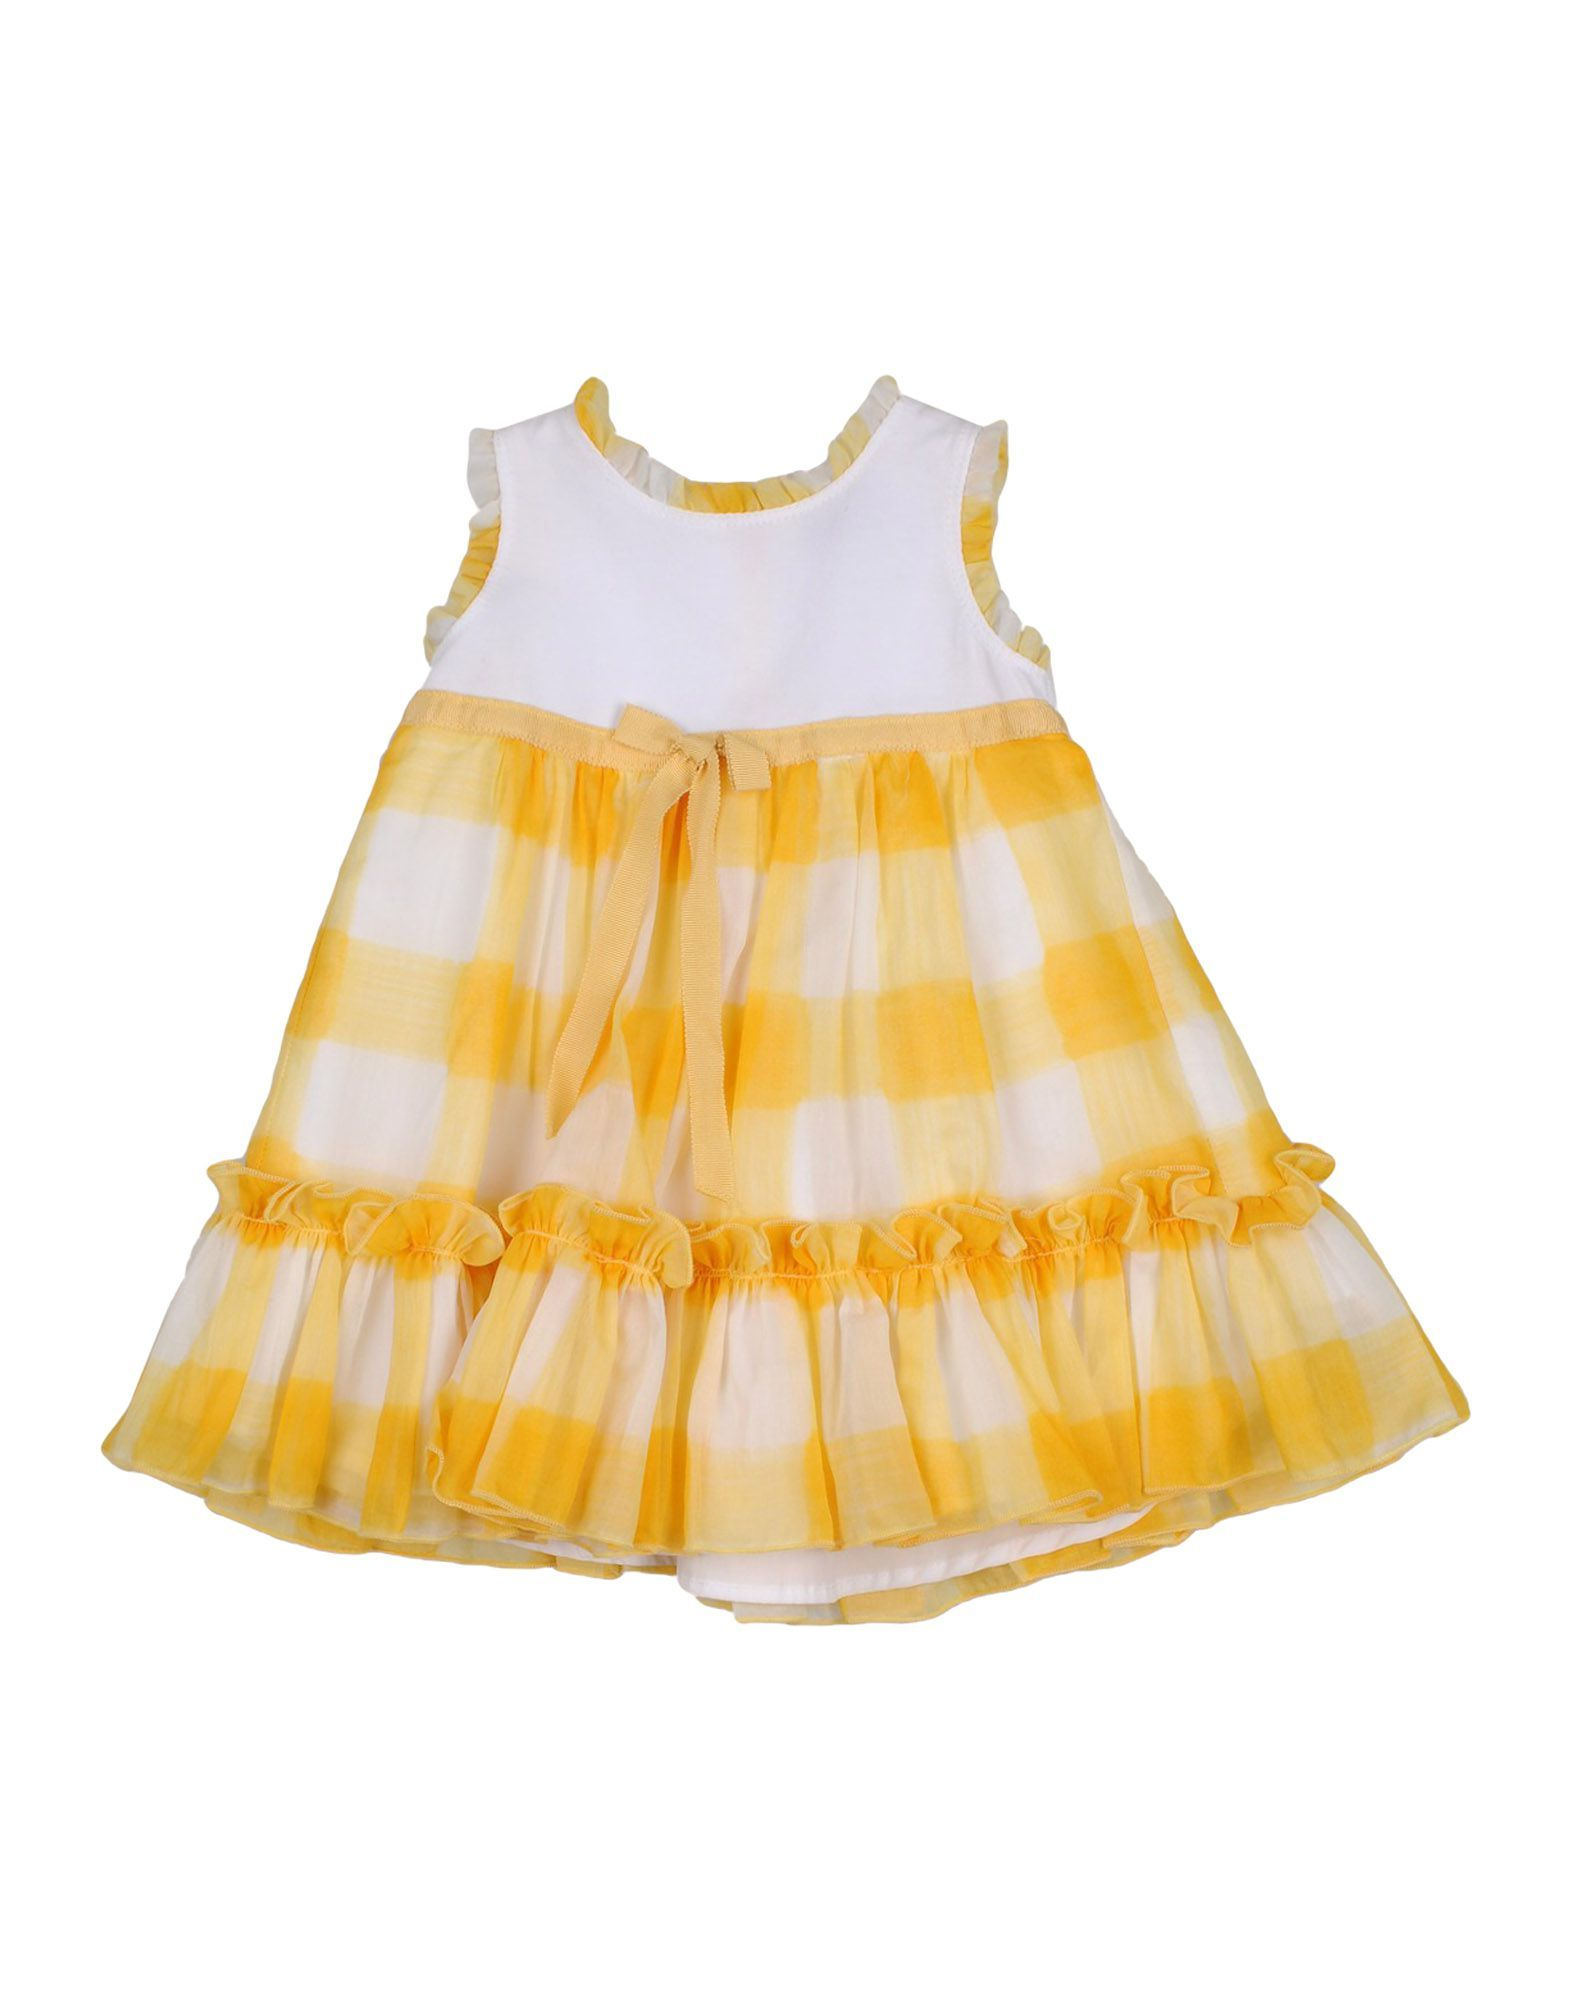 BODYSUITS & SETS Monnalisa Bebe' Yellow Girl Cotton